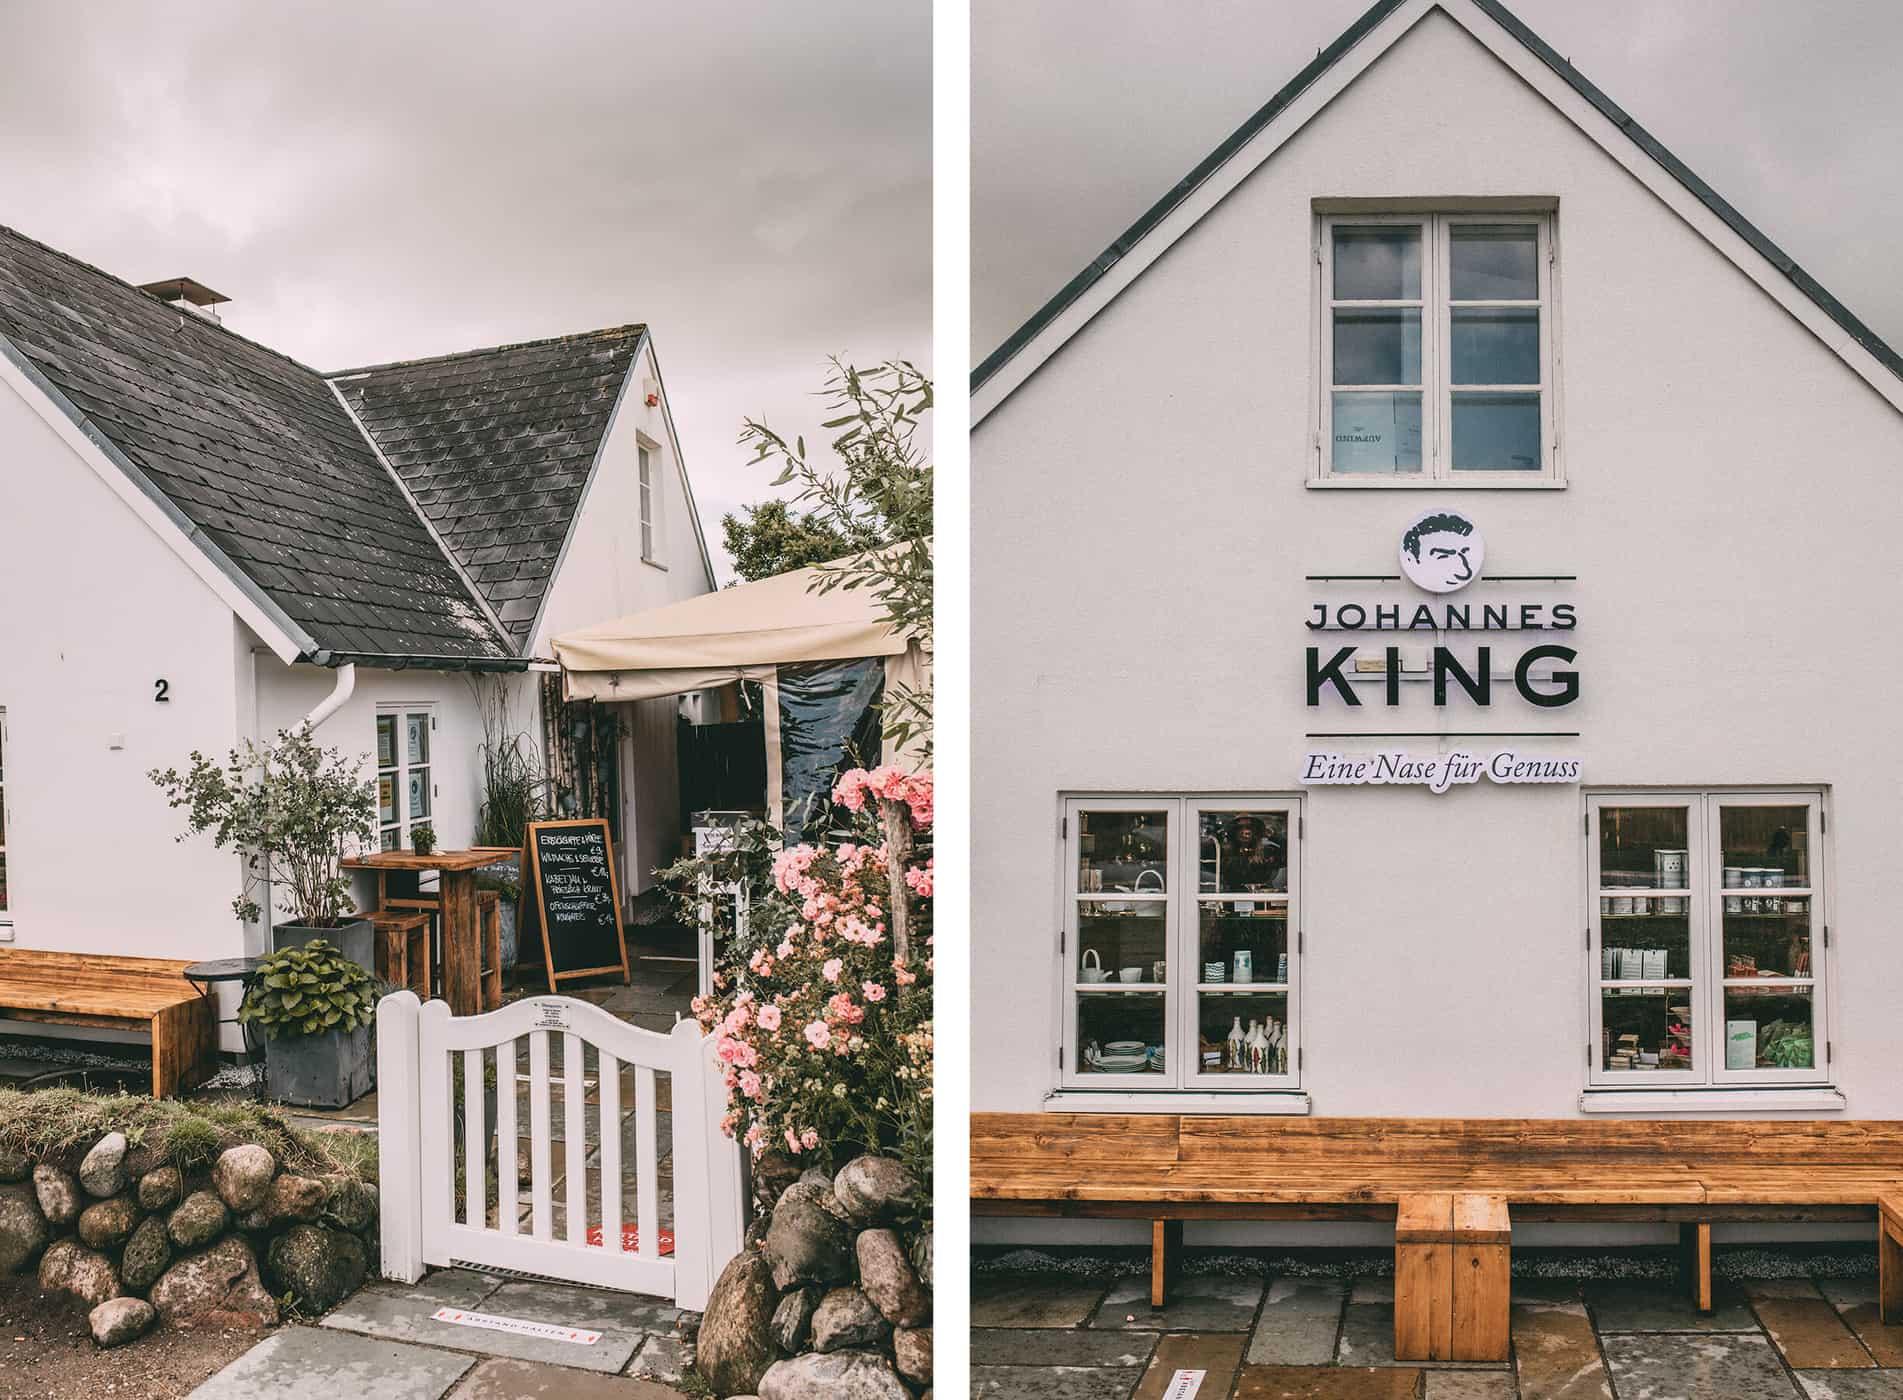 Johannes King Keitum Genuss-Shop Restaurant